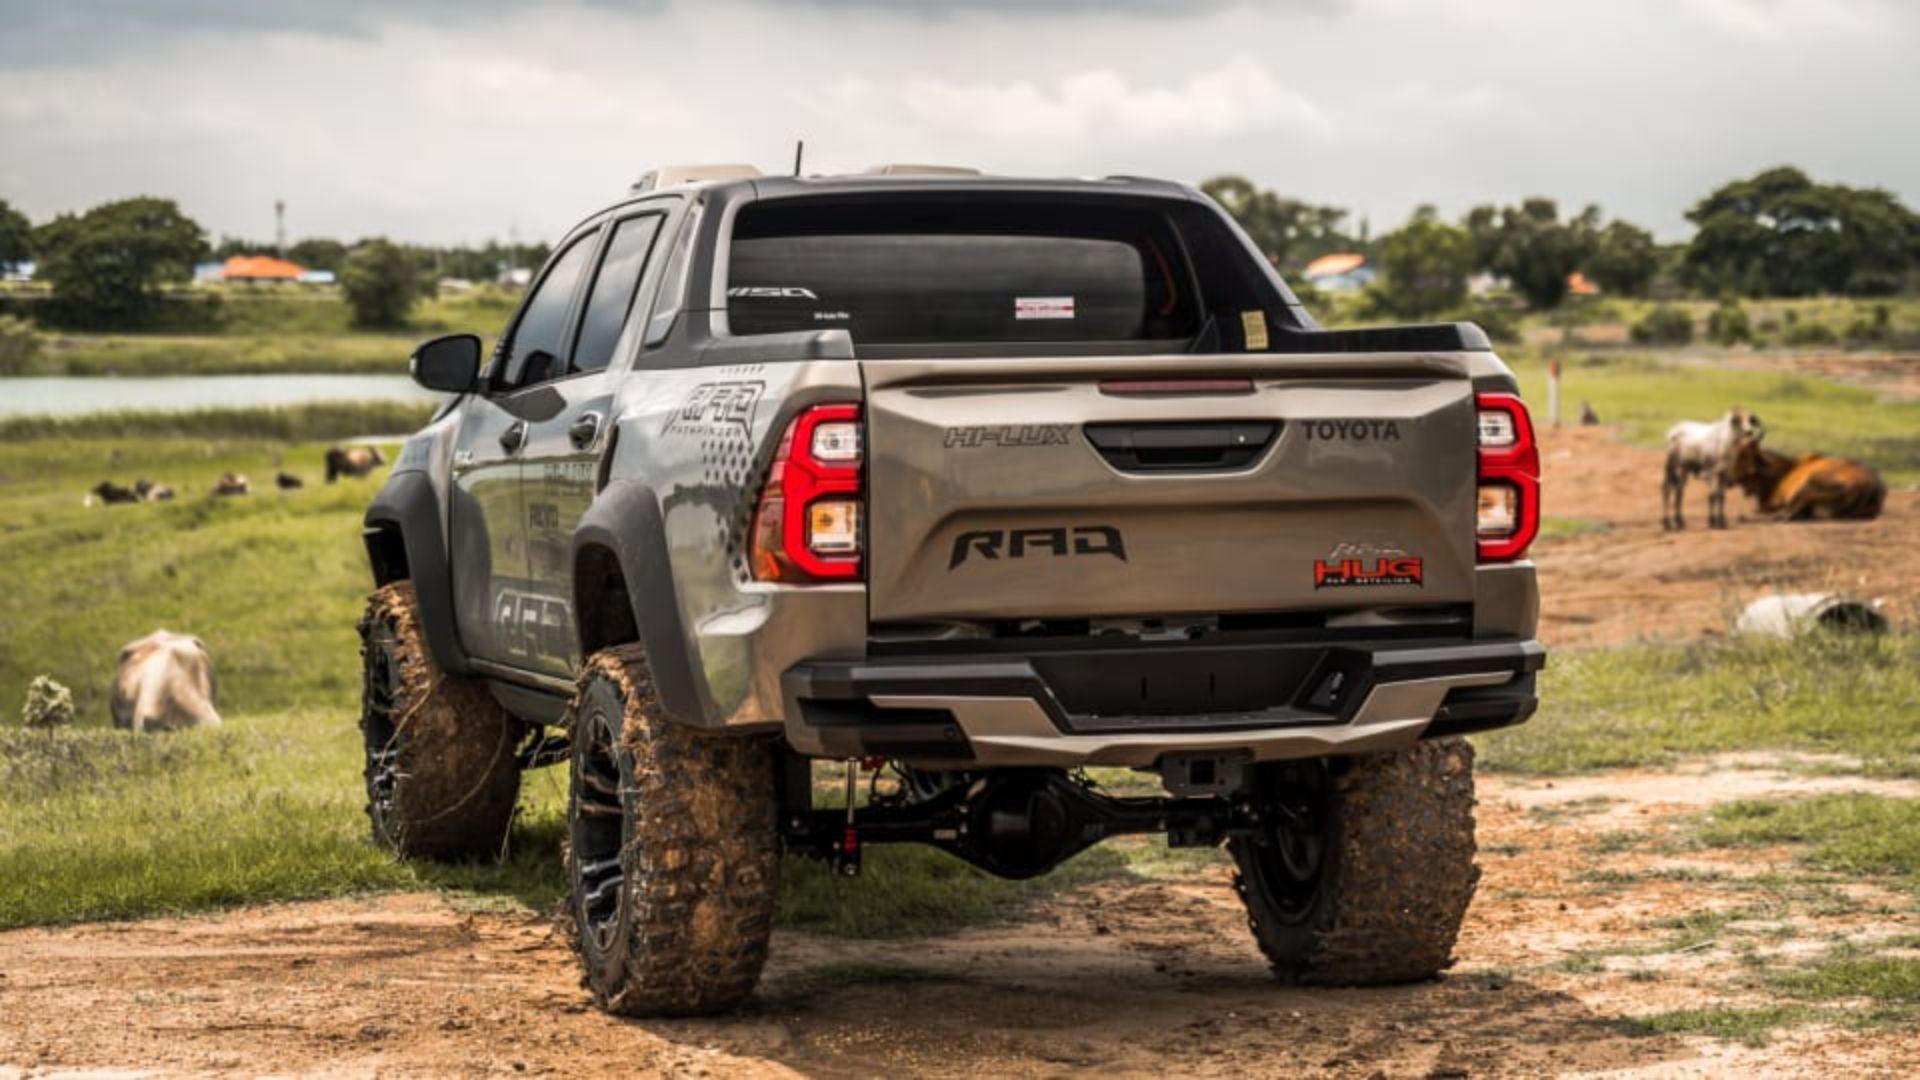 Toyota-Hilux-Pathfinder-by-RAD-8